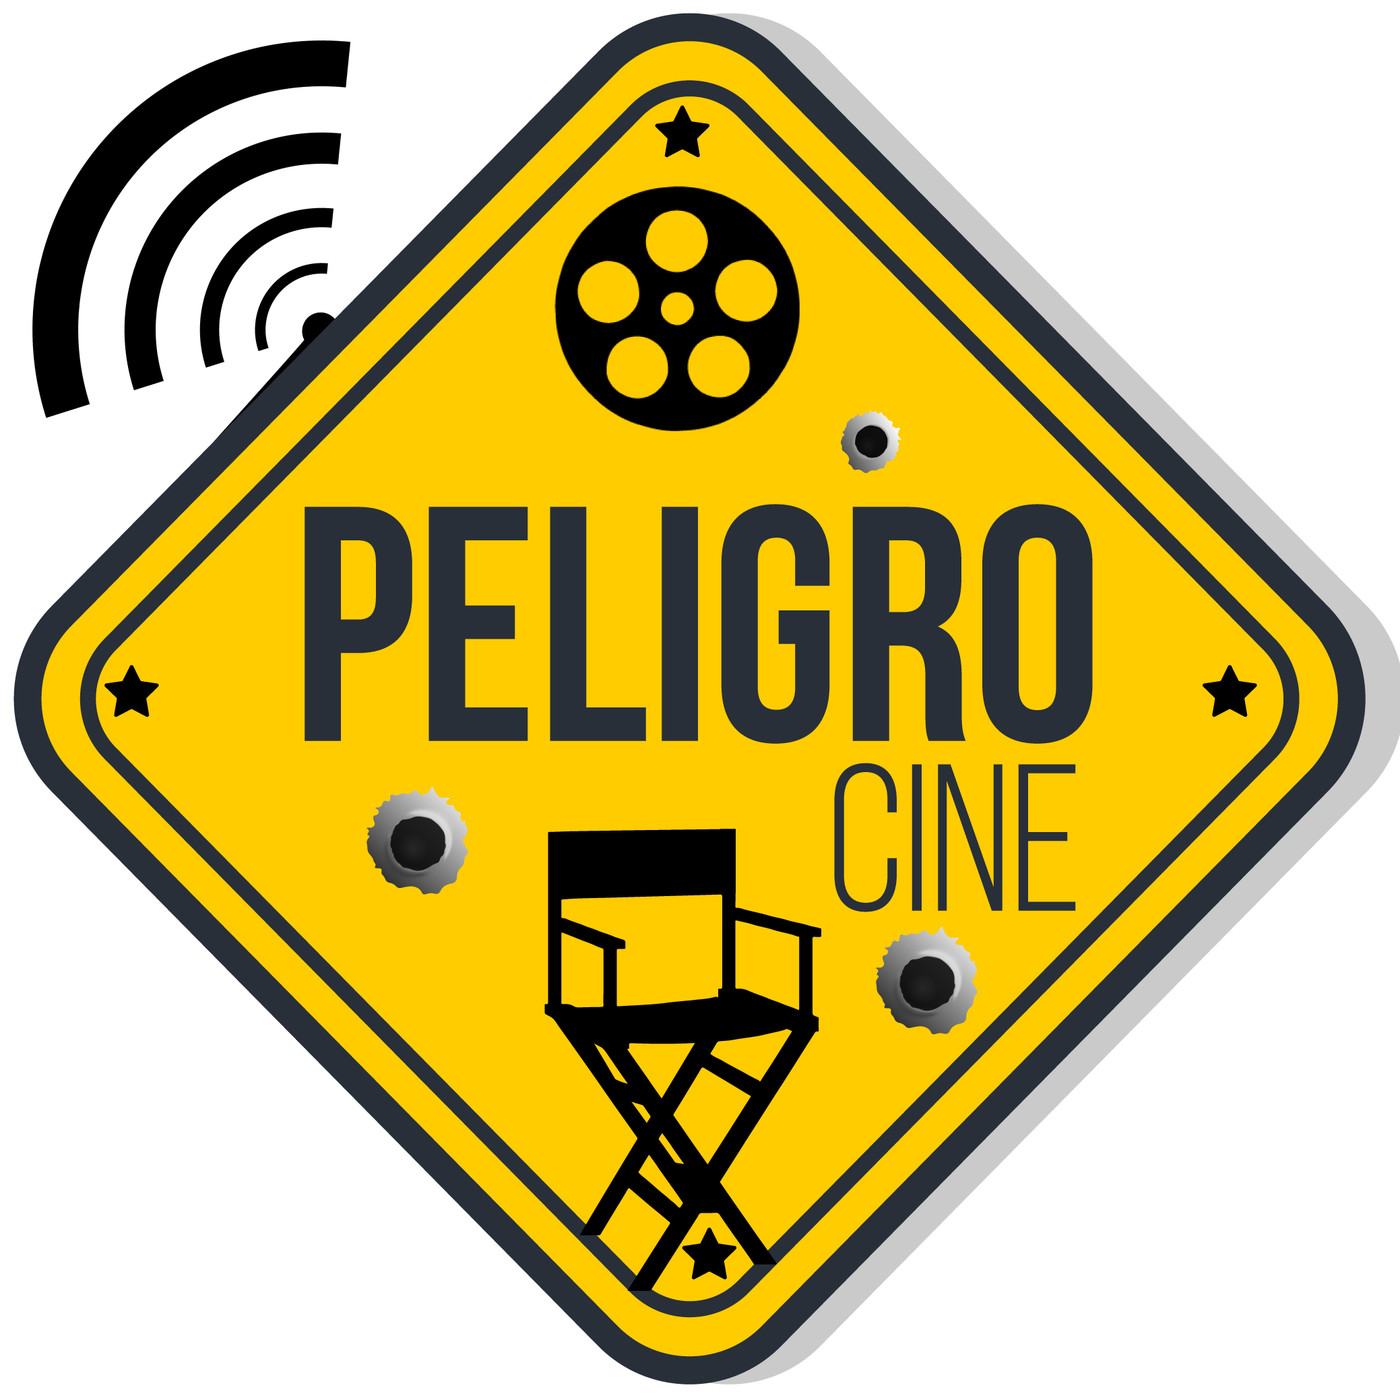 Peligro, Cine 2x07 - Thriller y Suspense - La mejor oferta - Hierro - Hitchcock - Clouzot - Tornatore - Rob Reiner